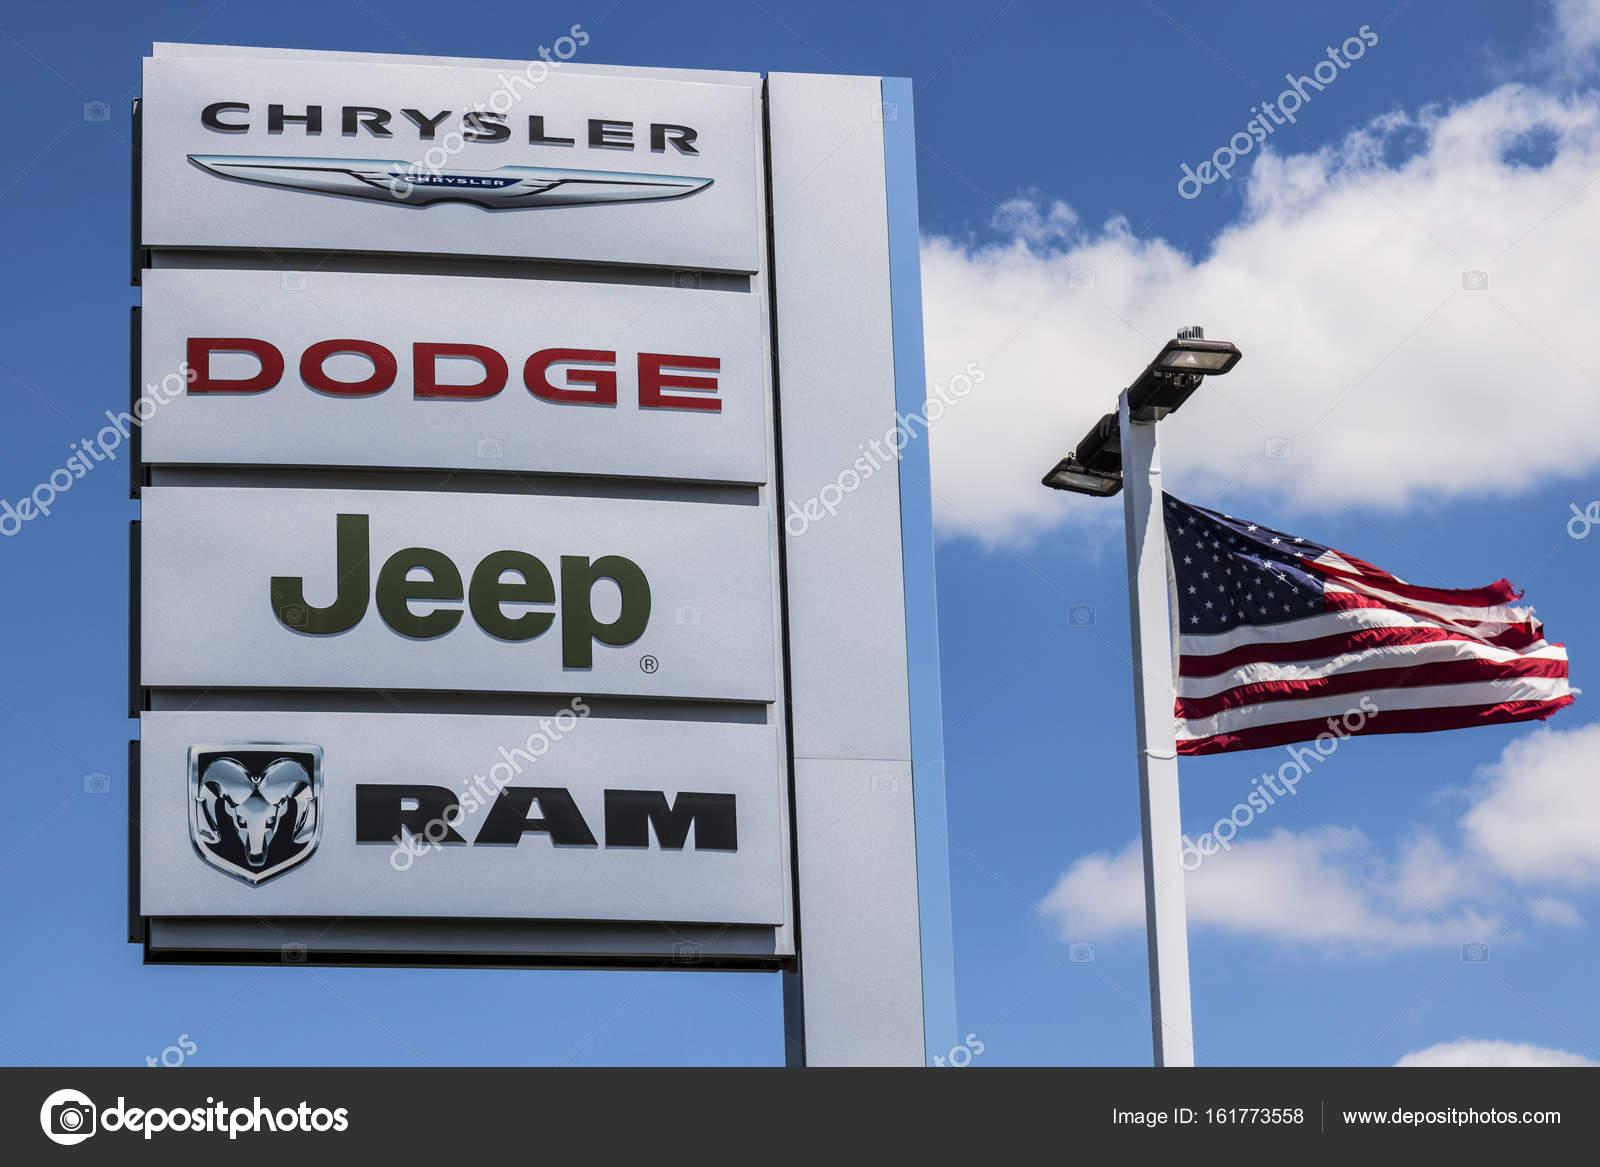 Indianapolis Circa July Logo And Dealership Signage Of The - Chrysler dealer indianapolis